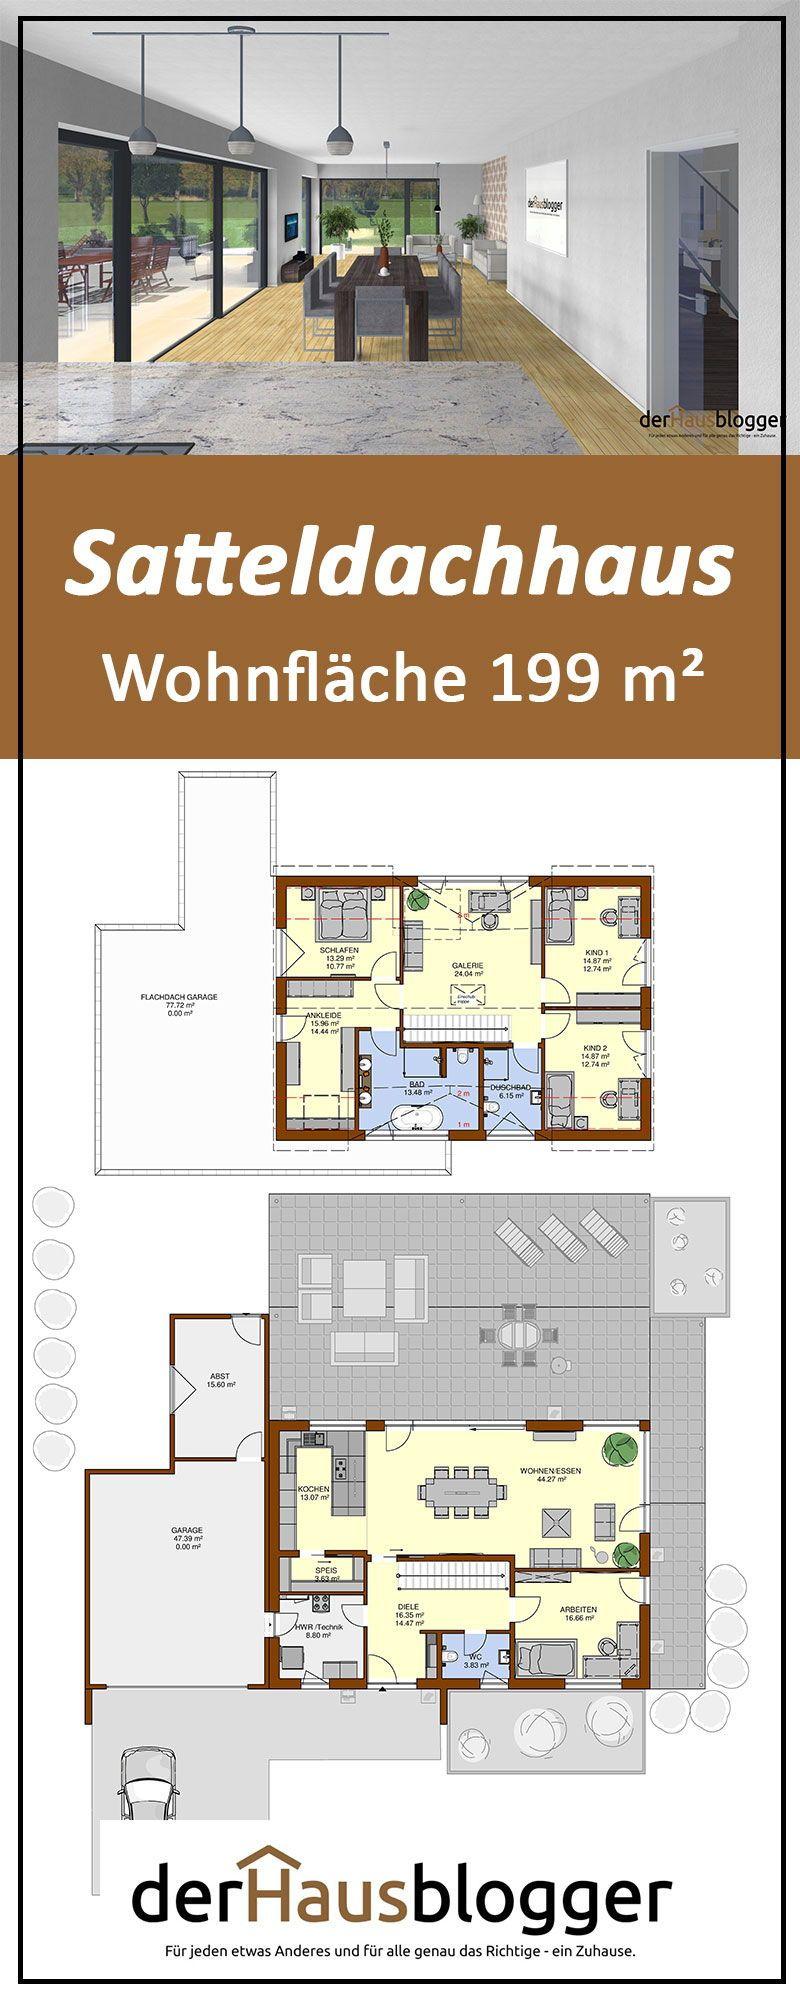 Photo of Satteldachhaus 199m² | derHausblogger